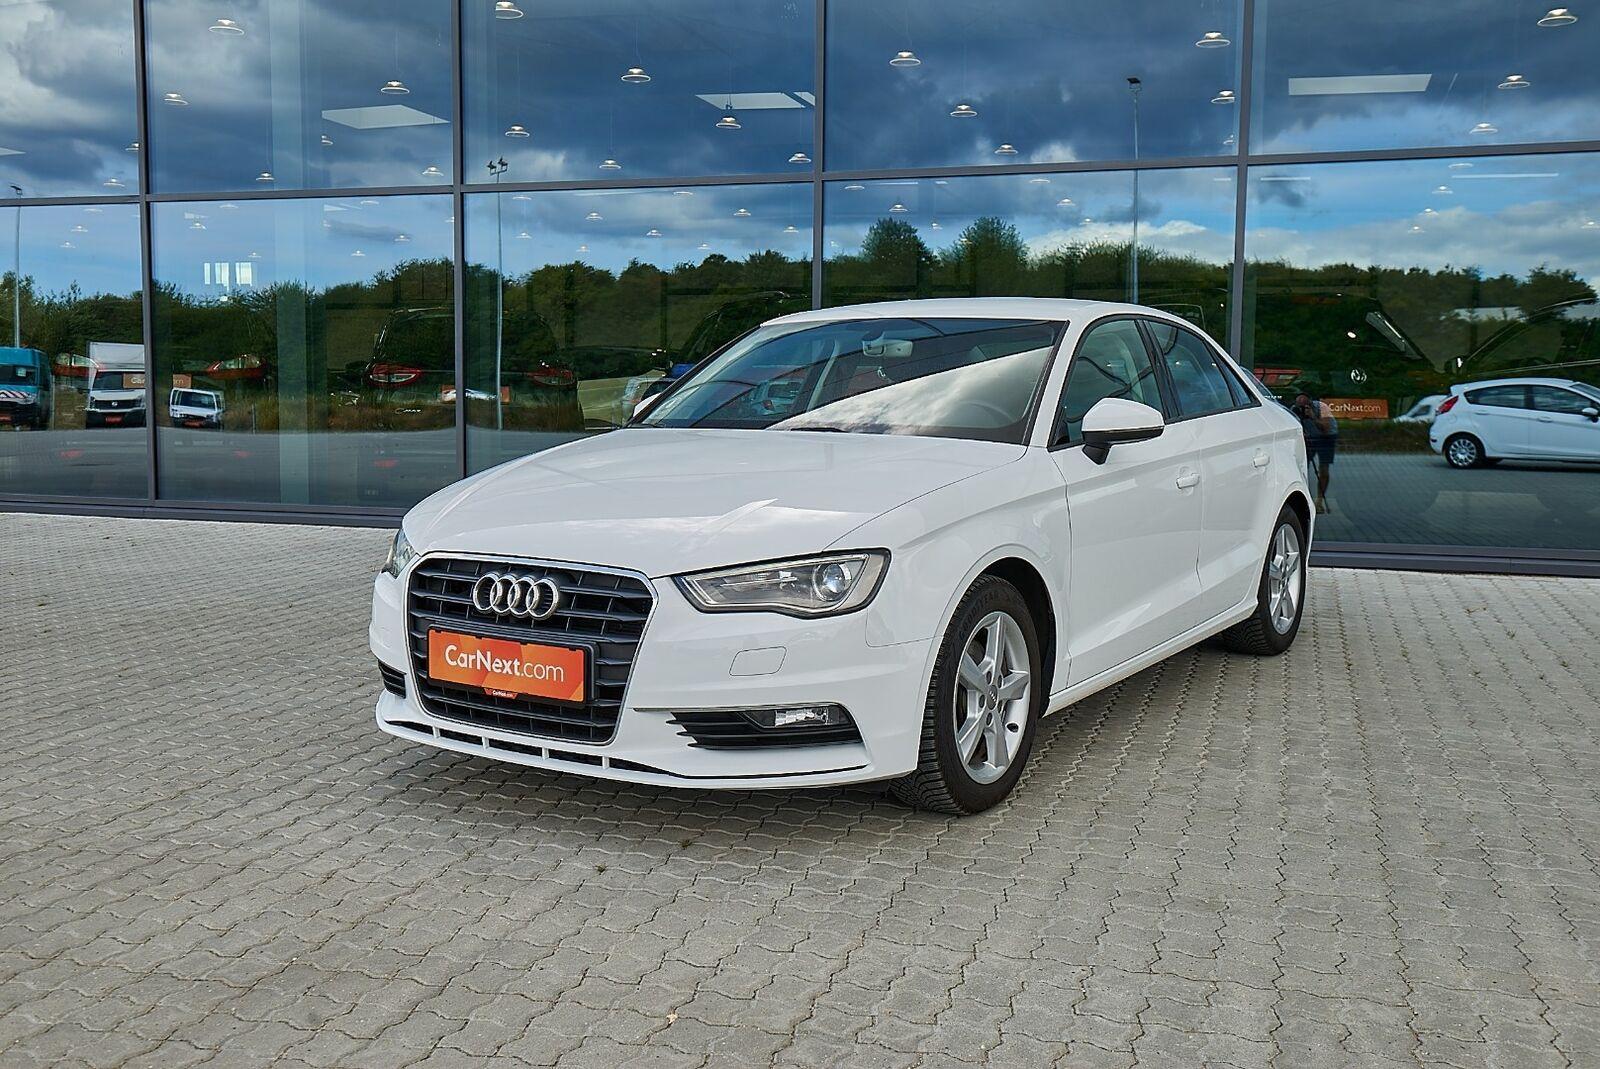 Audi A3 2,0 TDi 150 Ambition 4d - 194.900 kr.